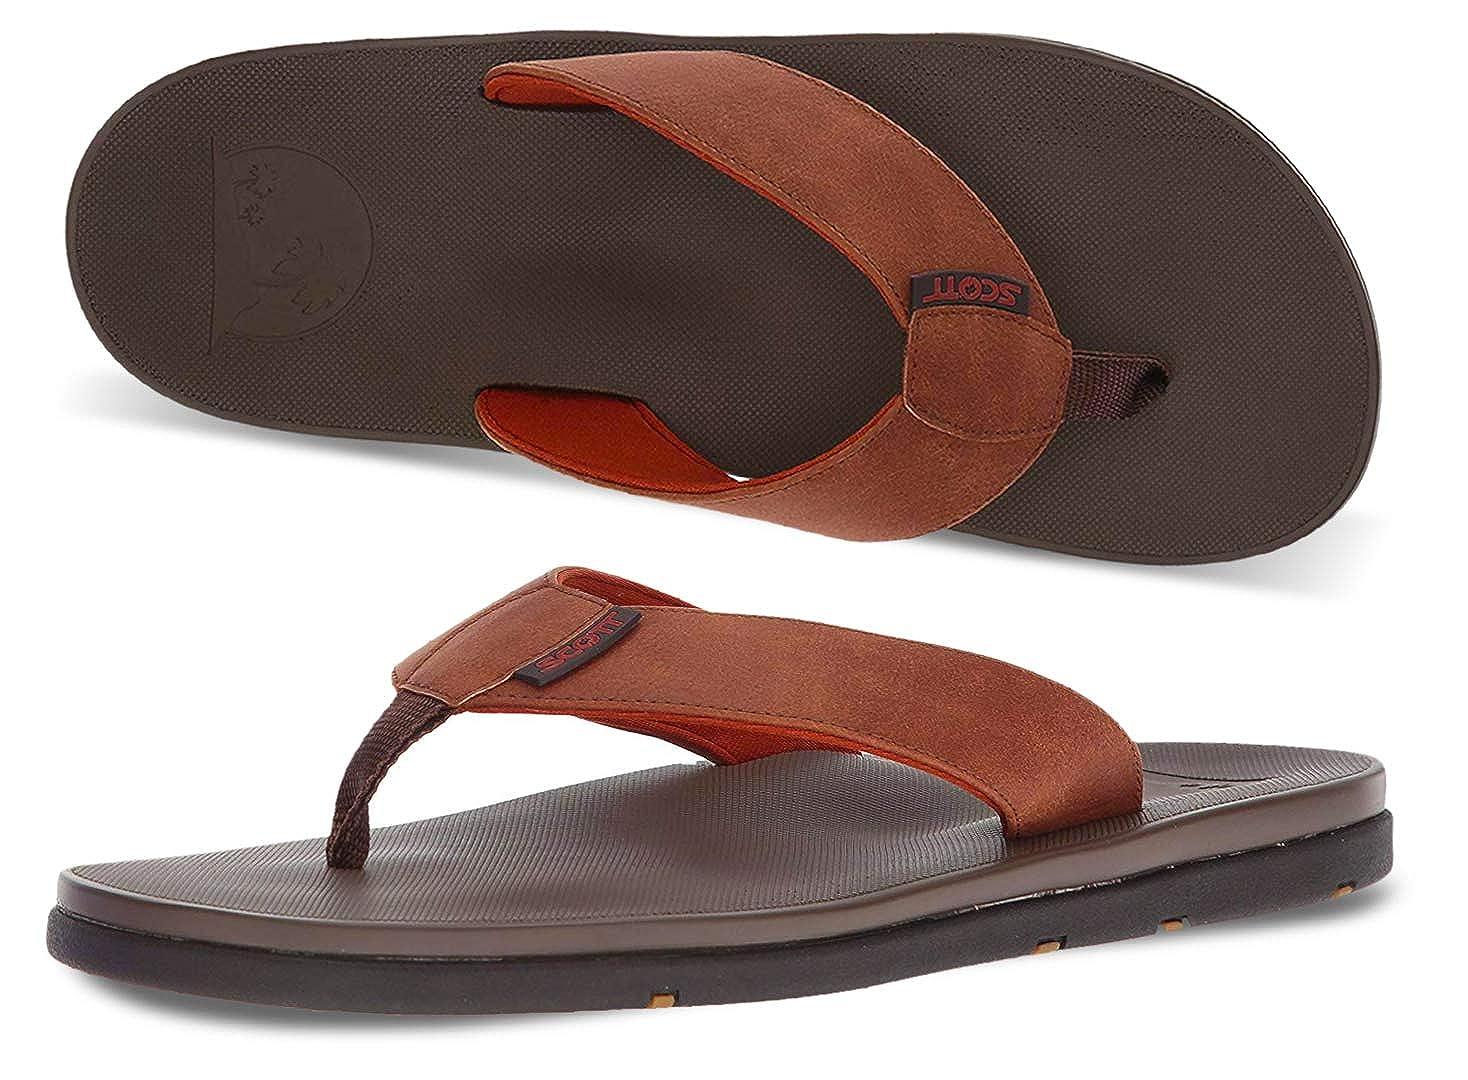 Guarantee All Day Arch Support Comfortable Slipper Reef Walking Flip Flops for Men Scott Hawaii Mens Hikino Vegan Leather Sandals Gray Brown Neoprene Comfort Waterproof Shoes